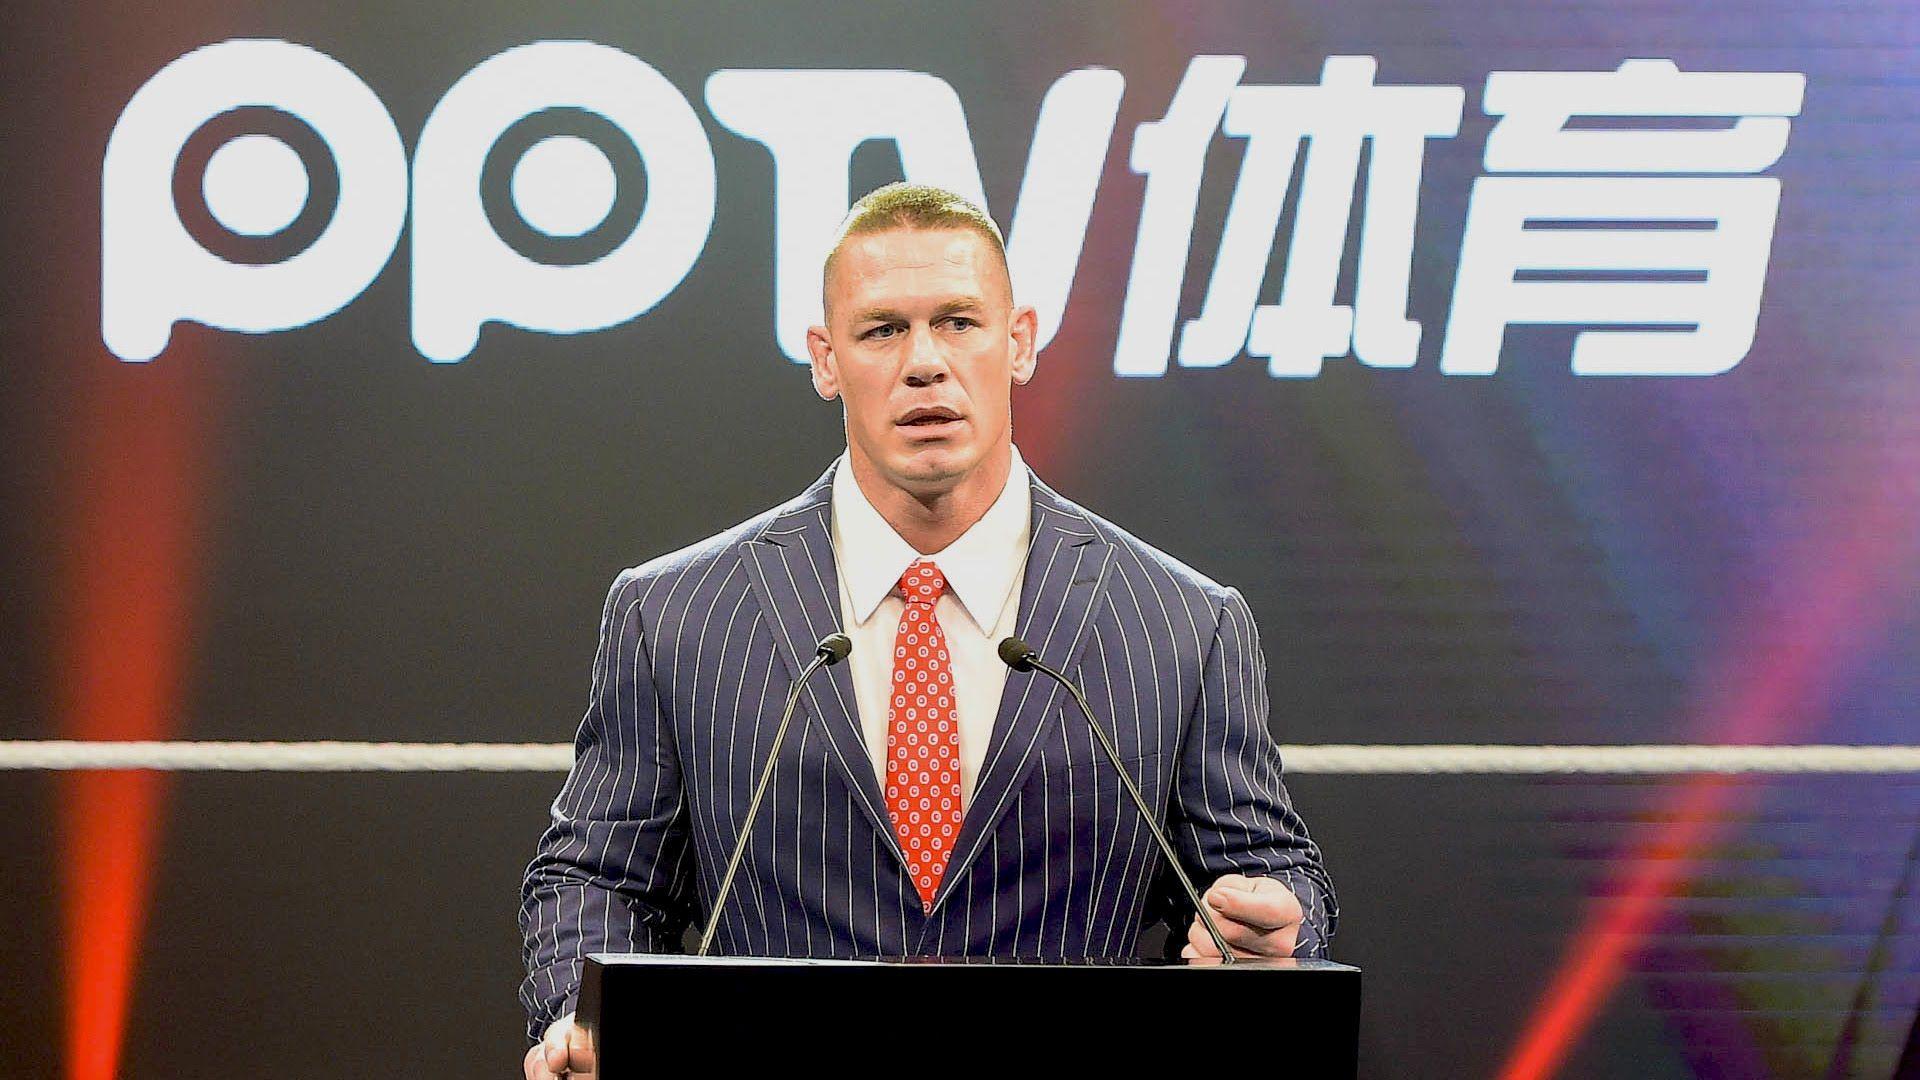 John Cena giving a speech